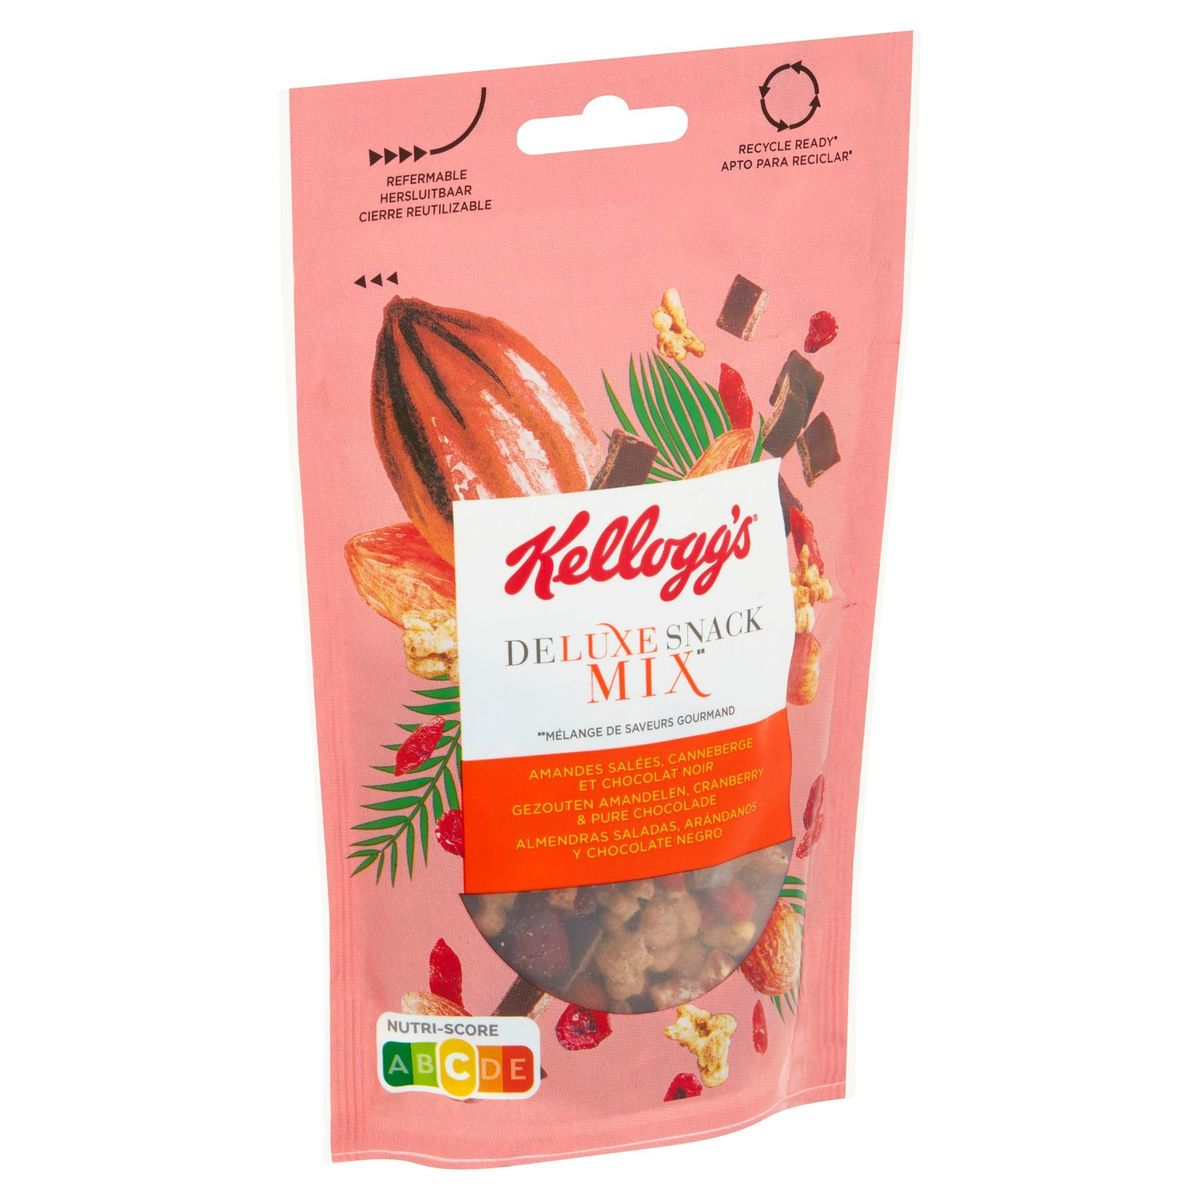 Kellogg's Deluxe Snack salted almond, cranberry &dark chocolate 100g